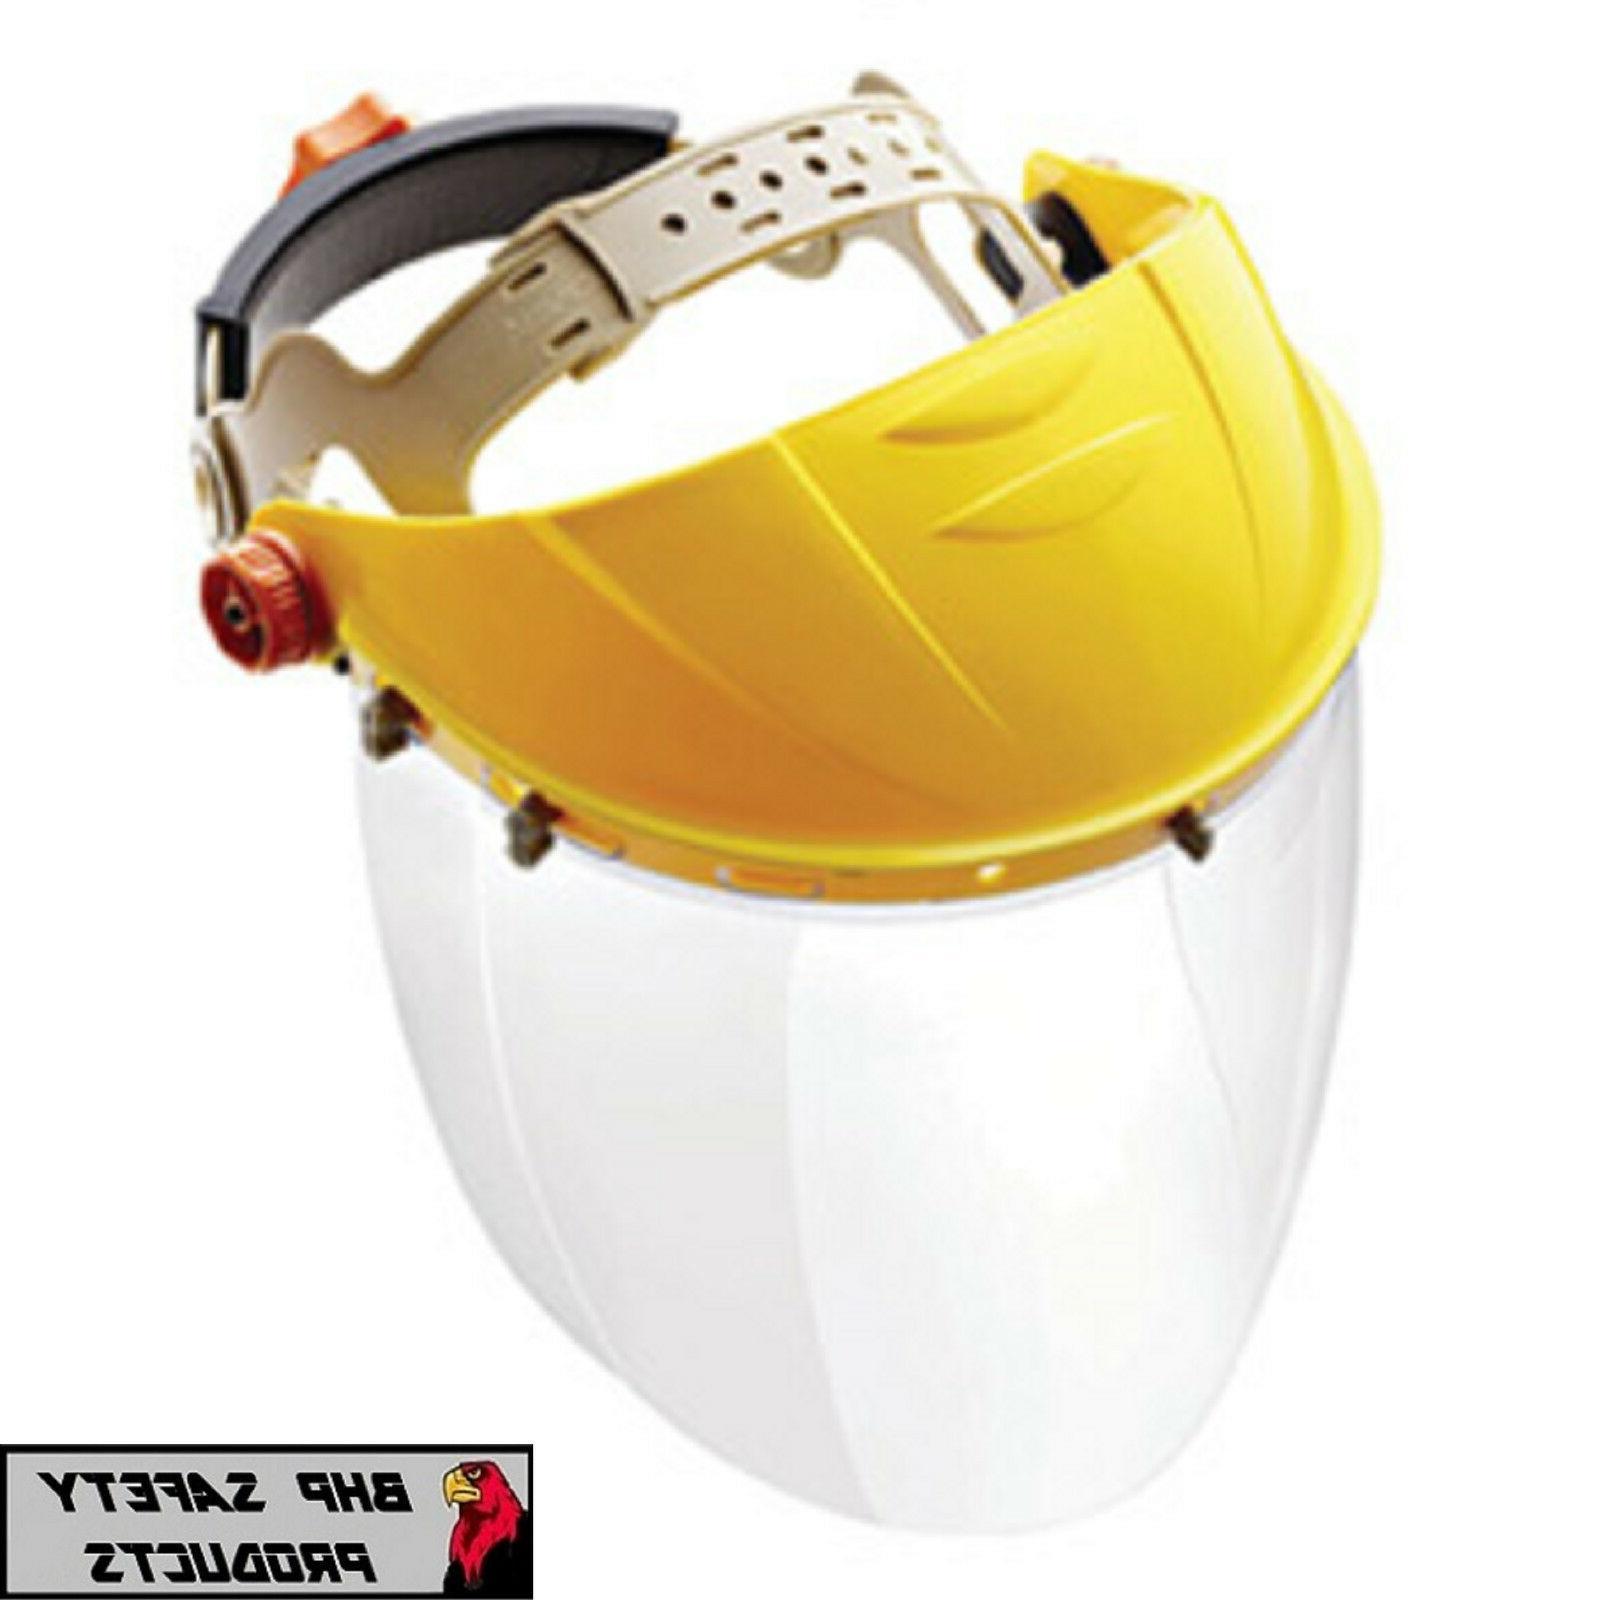 GATEWAY SAFETY VENOM HEADGEAR AND VISOR/FACESHIELD COMBO SAN